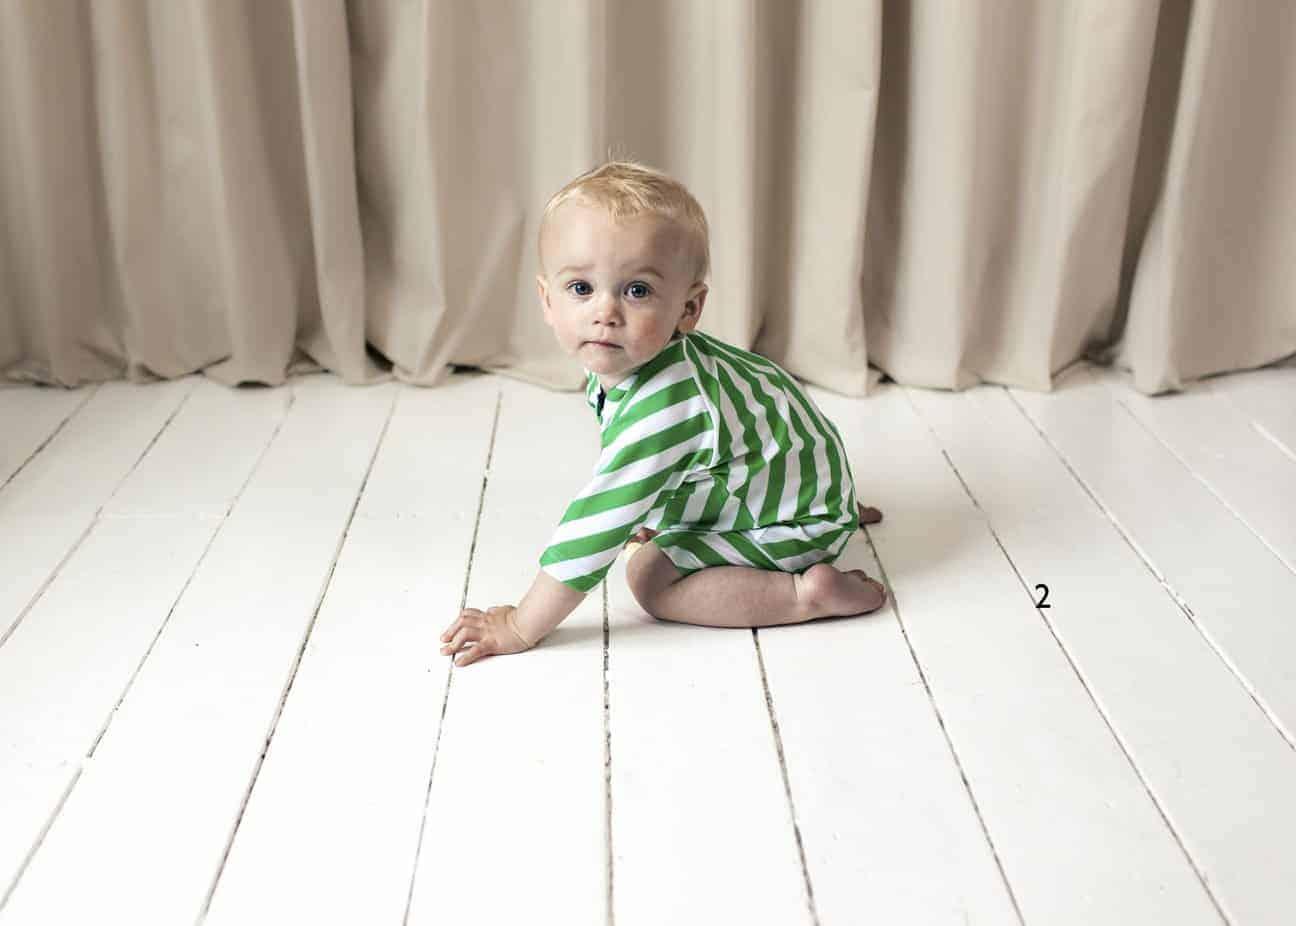 b047df6b9860 Baby Swim Romper - Diagonal Stripes - fistukidz.com